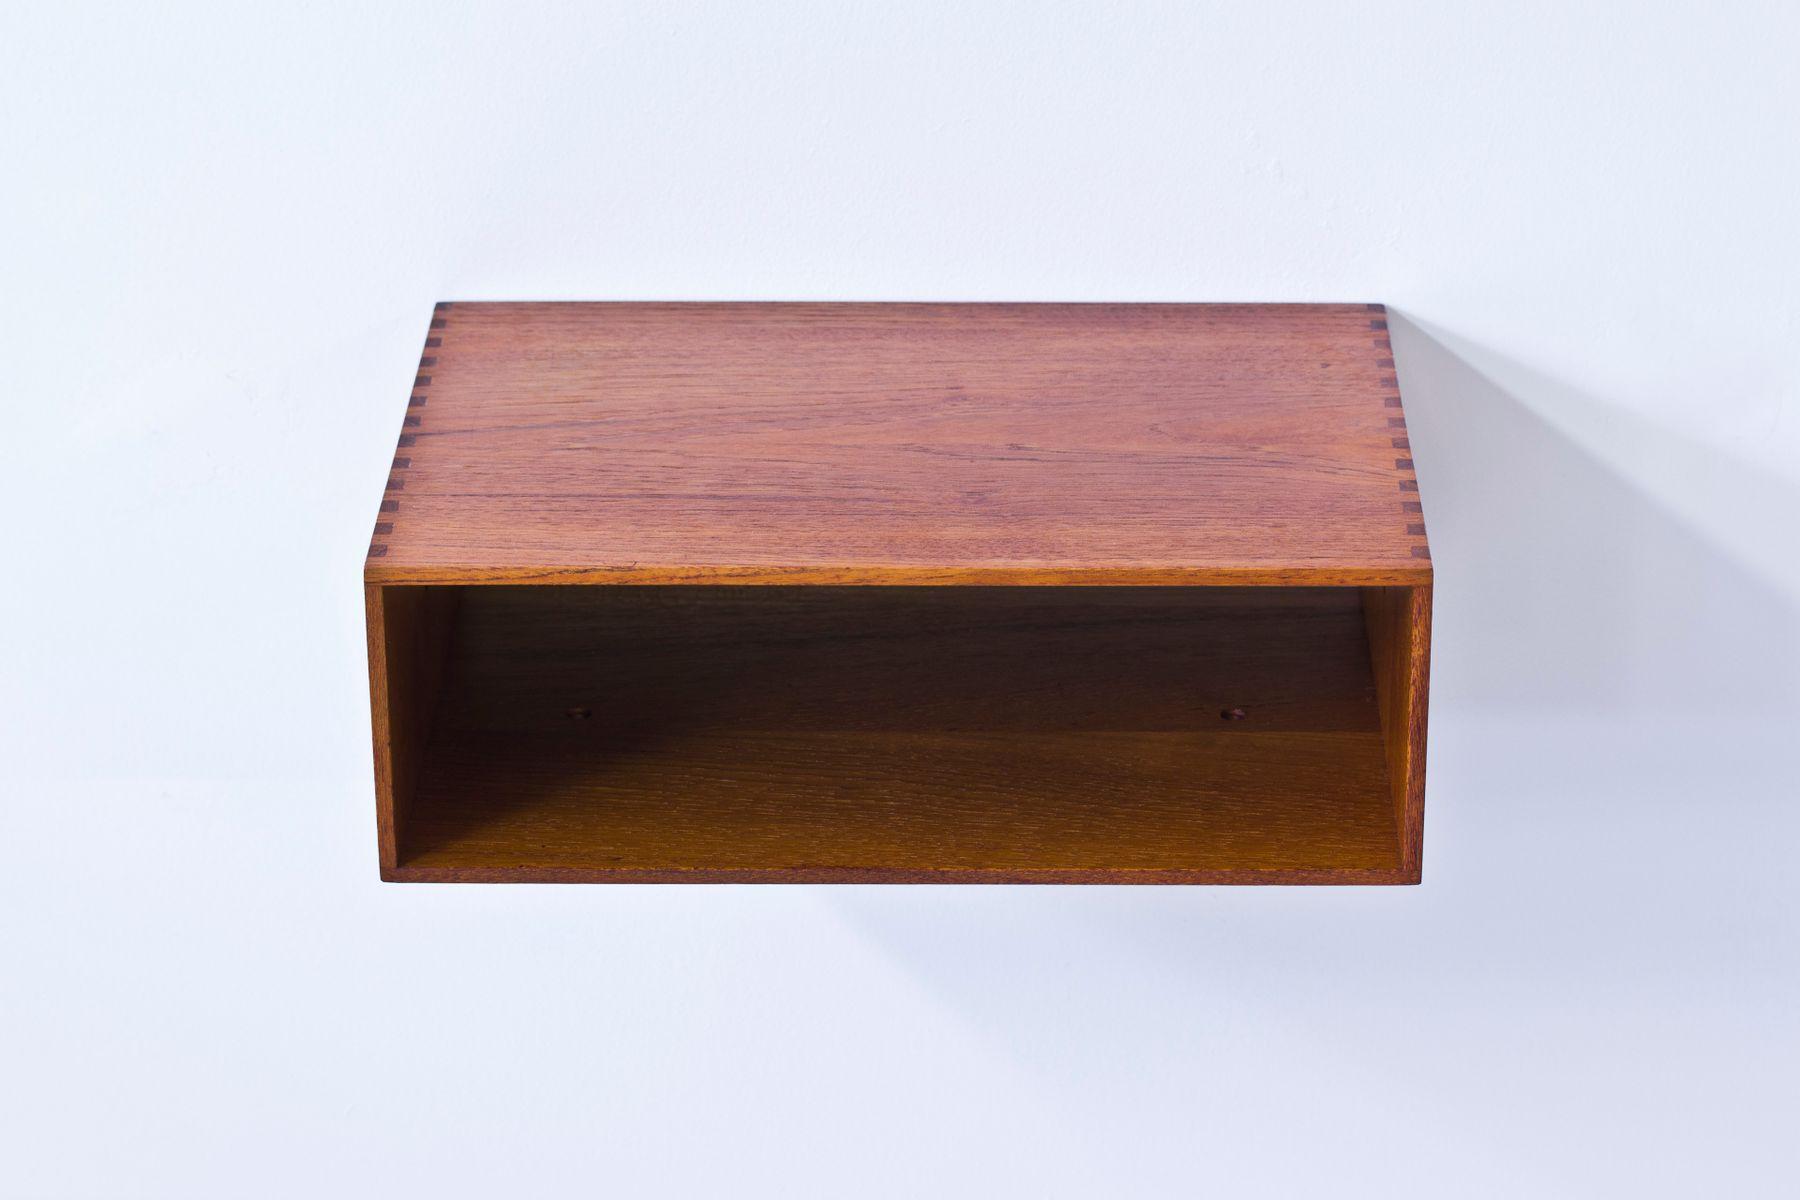 Hanging Vintage Bedside Tables by Uno & Östen Kristiansson for ...